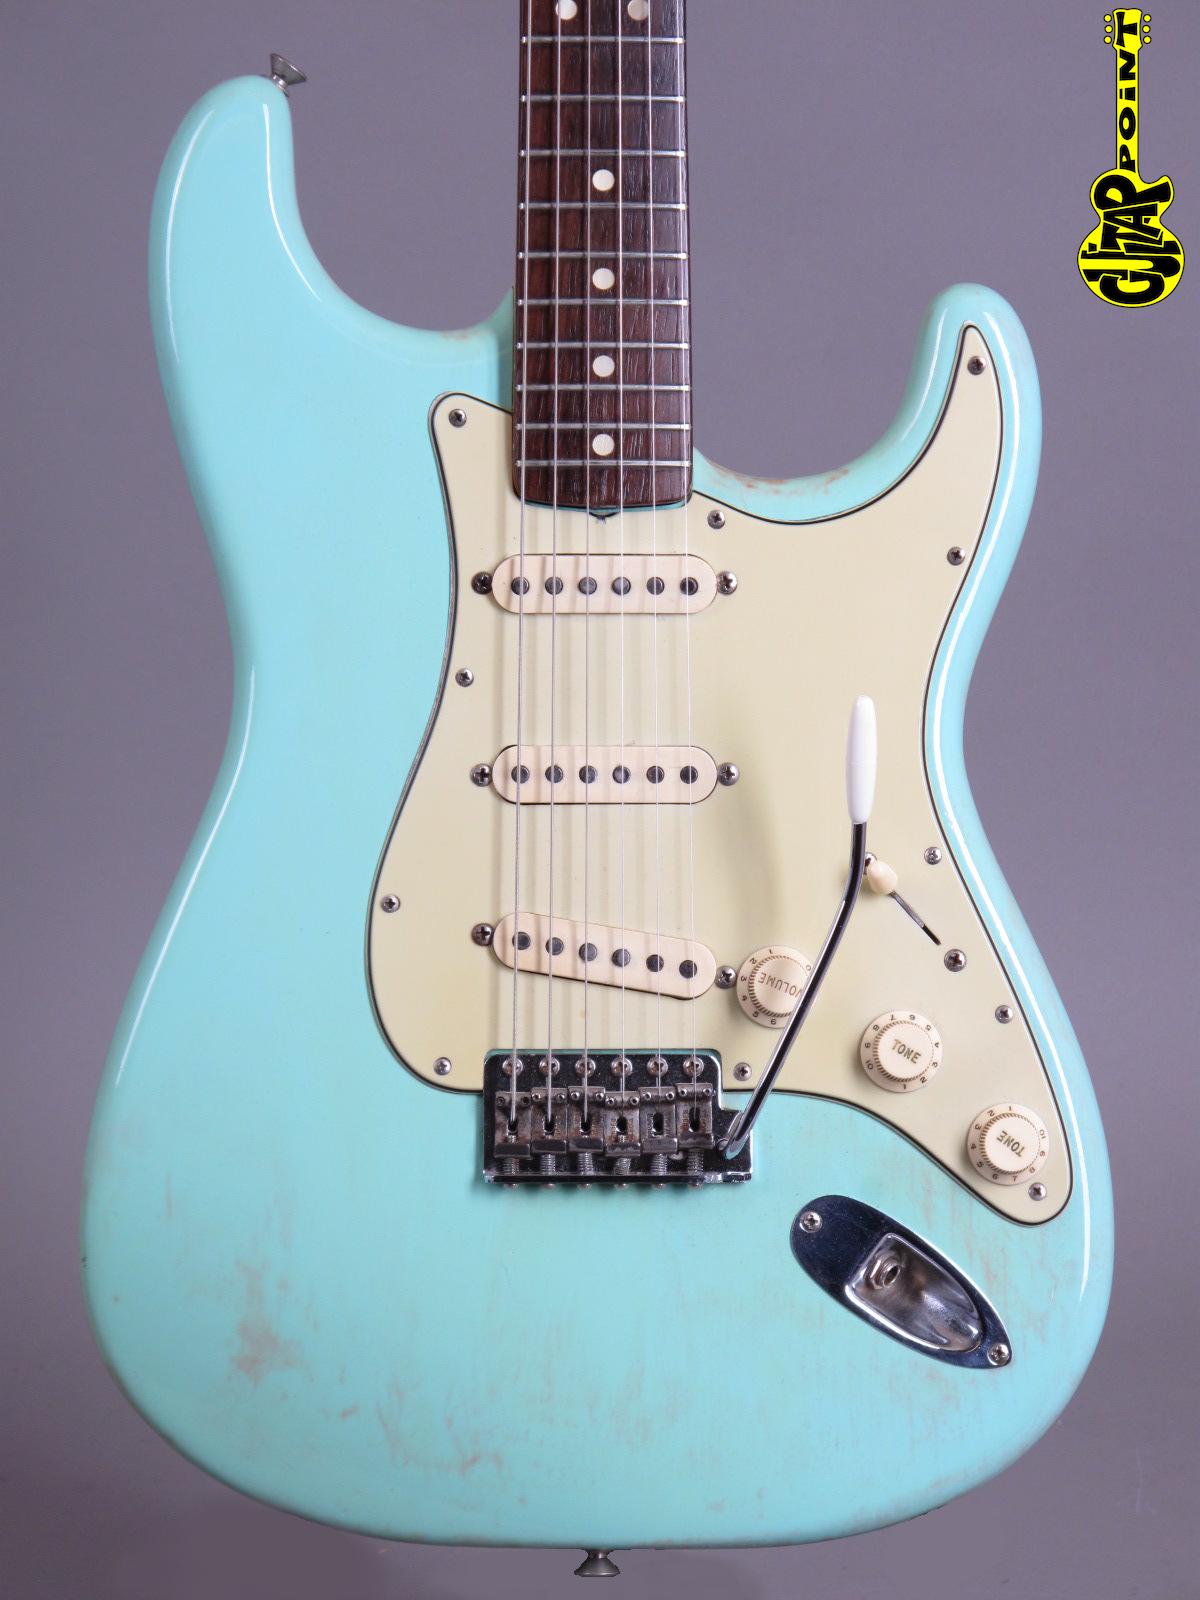 1964 Fender Stratocaster - Surf Green Refin